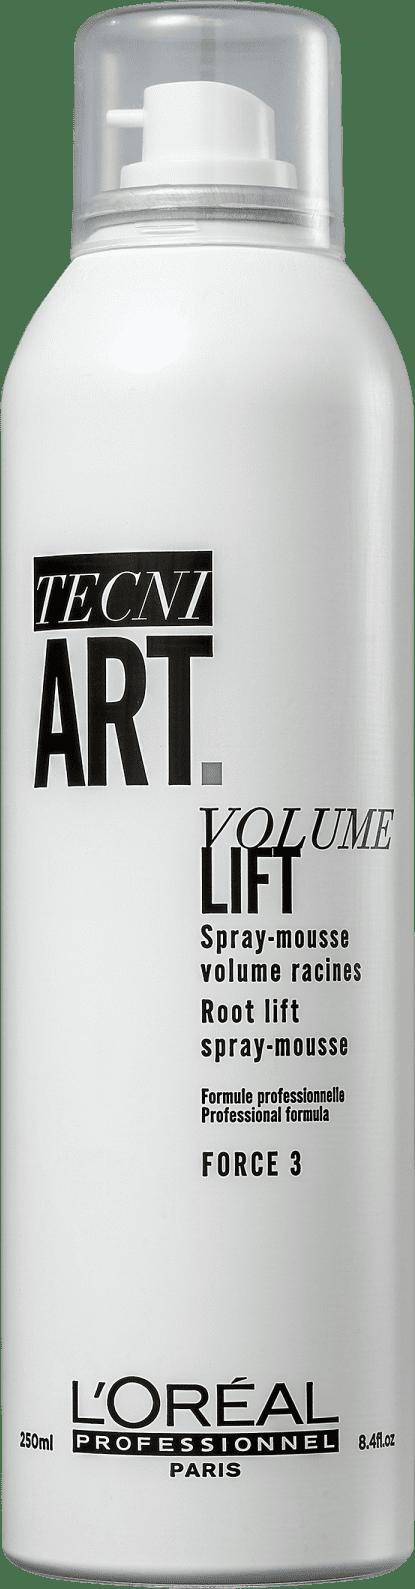 Finalizador Mousse Raiz Tecni Art Volume Lift 250ml Loreal